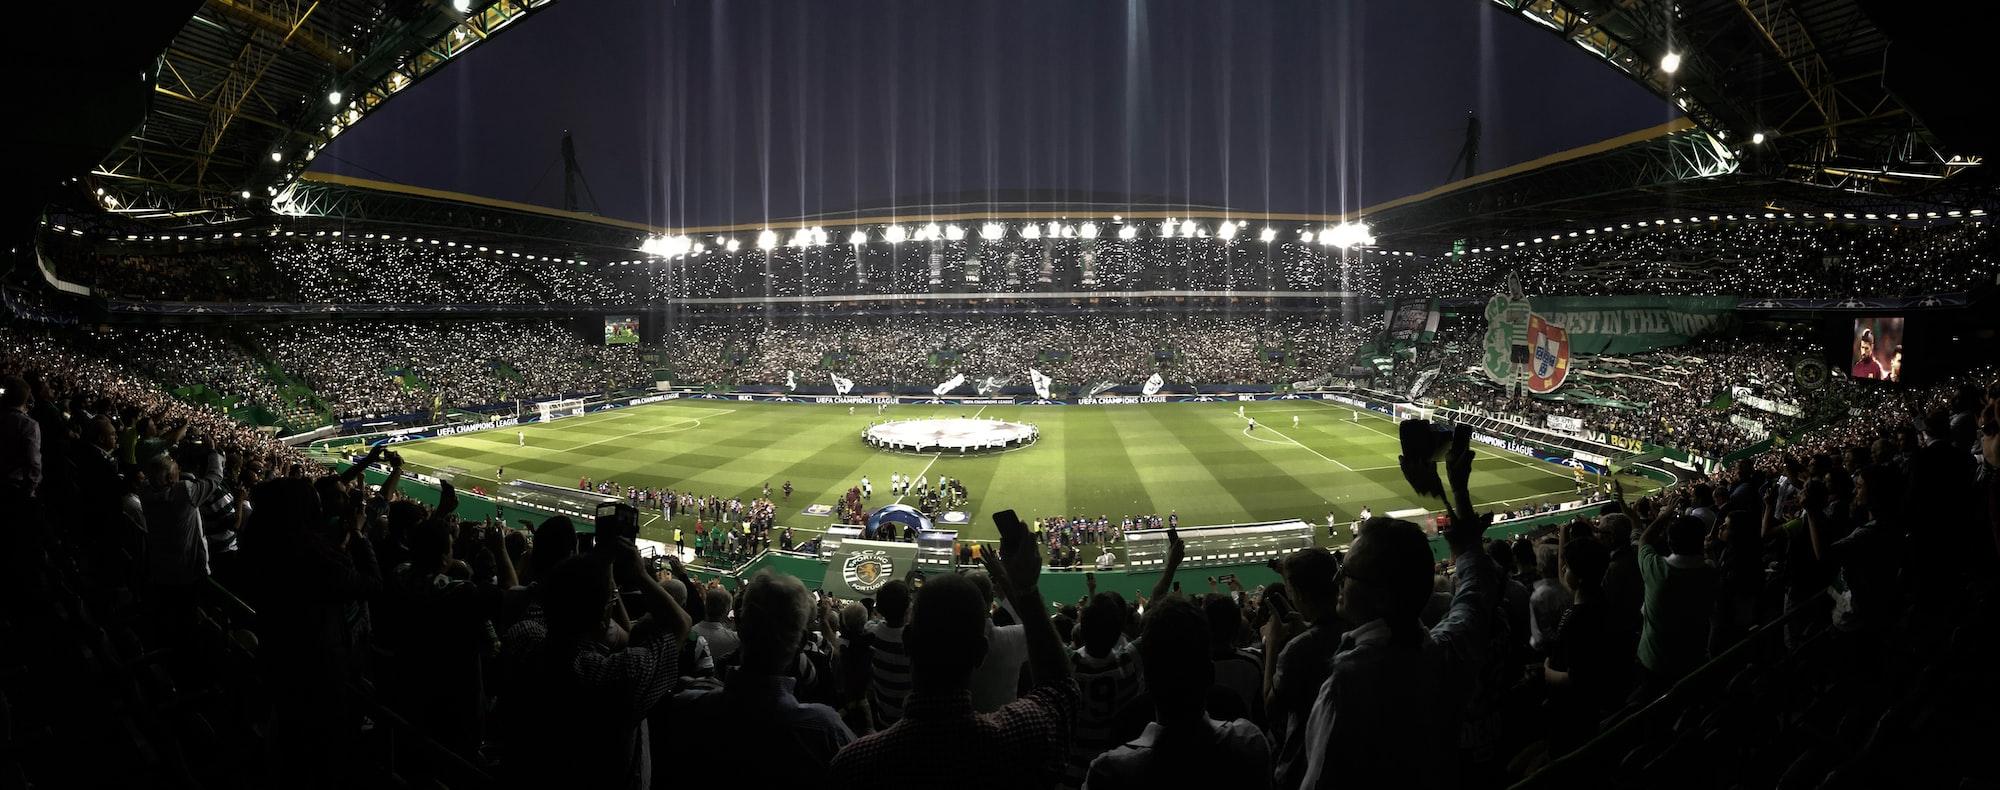 Semifinali Champions League: pronostico Psg-Manchester City